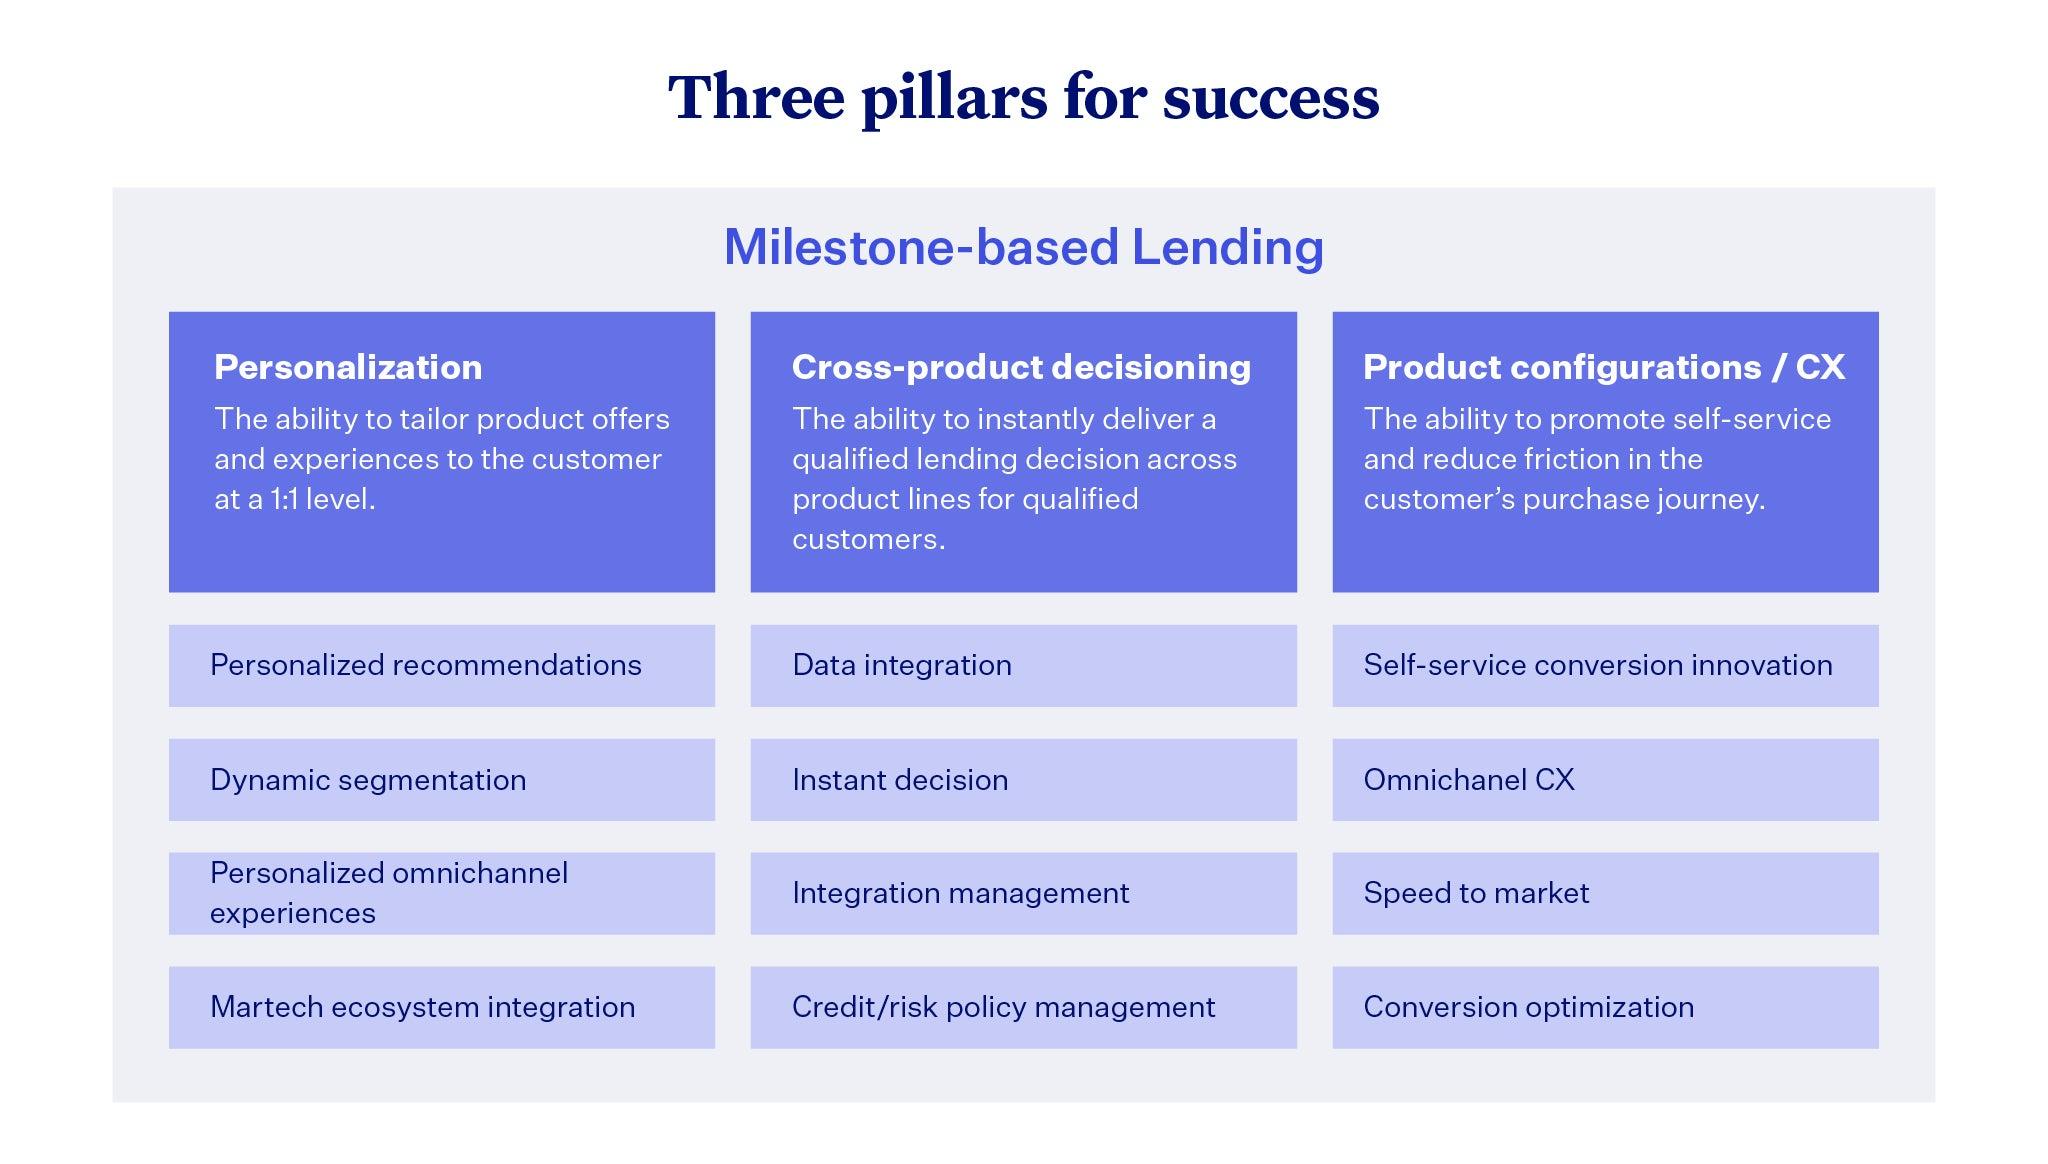 Three pillars of success for milestone-based lending